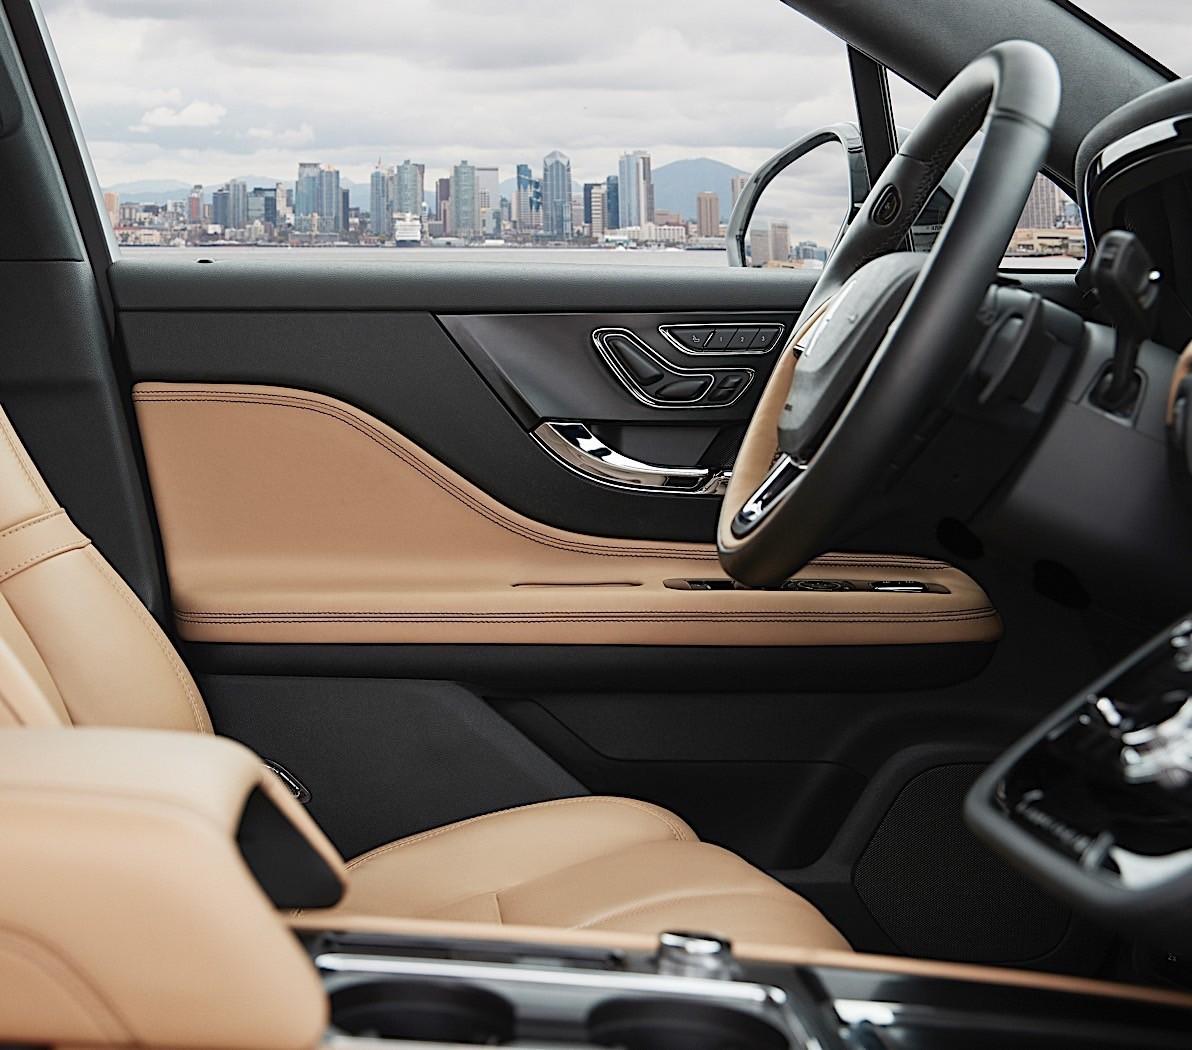 2020 Lincoln Corsair Review